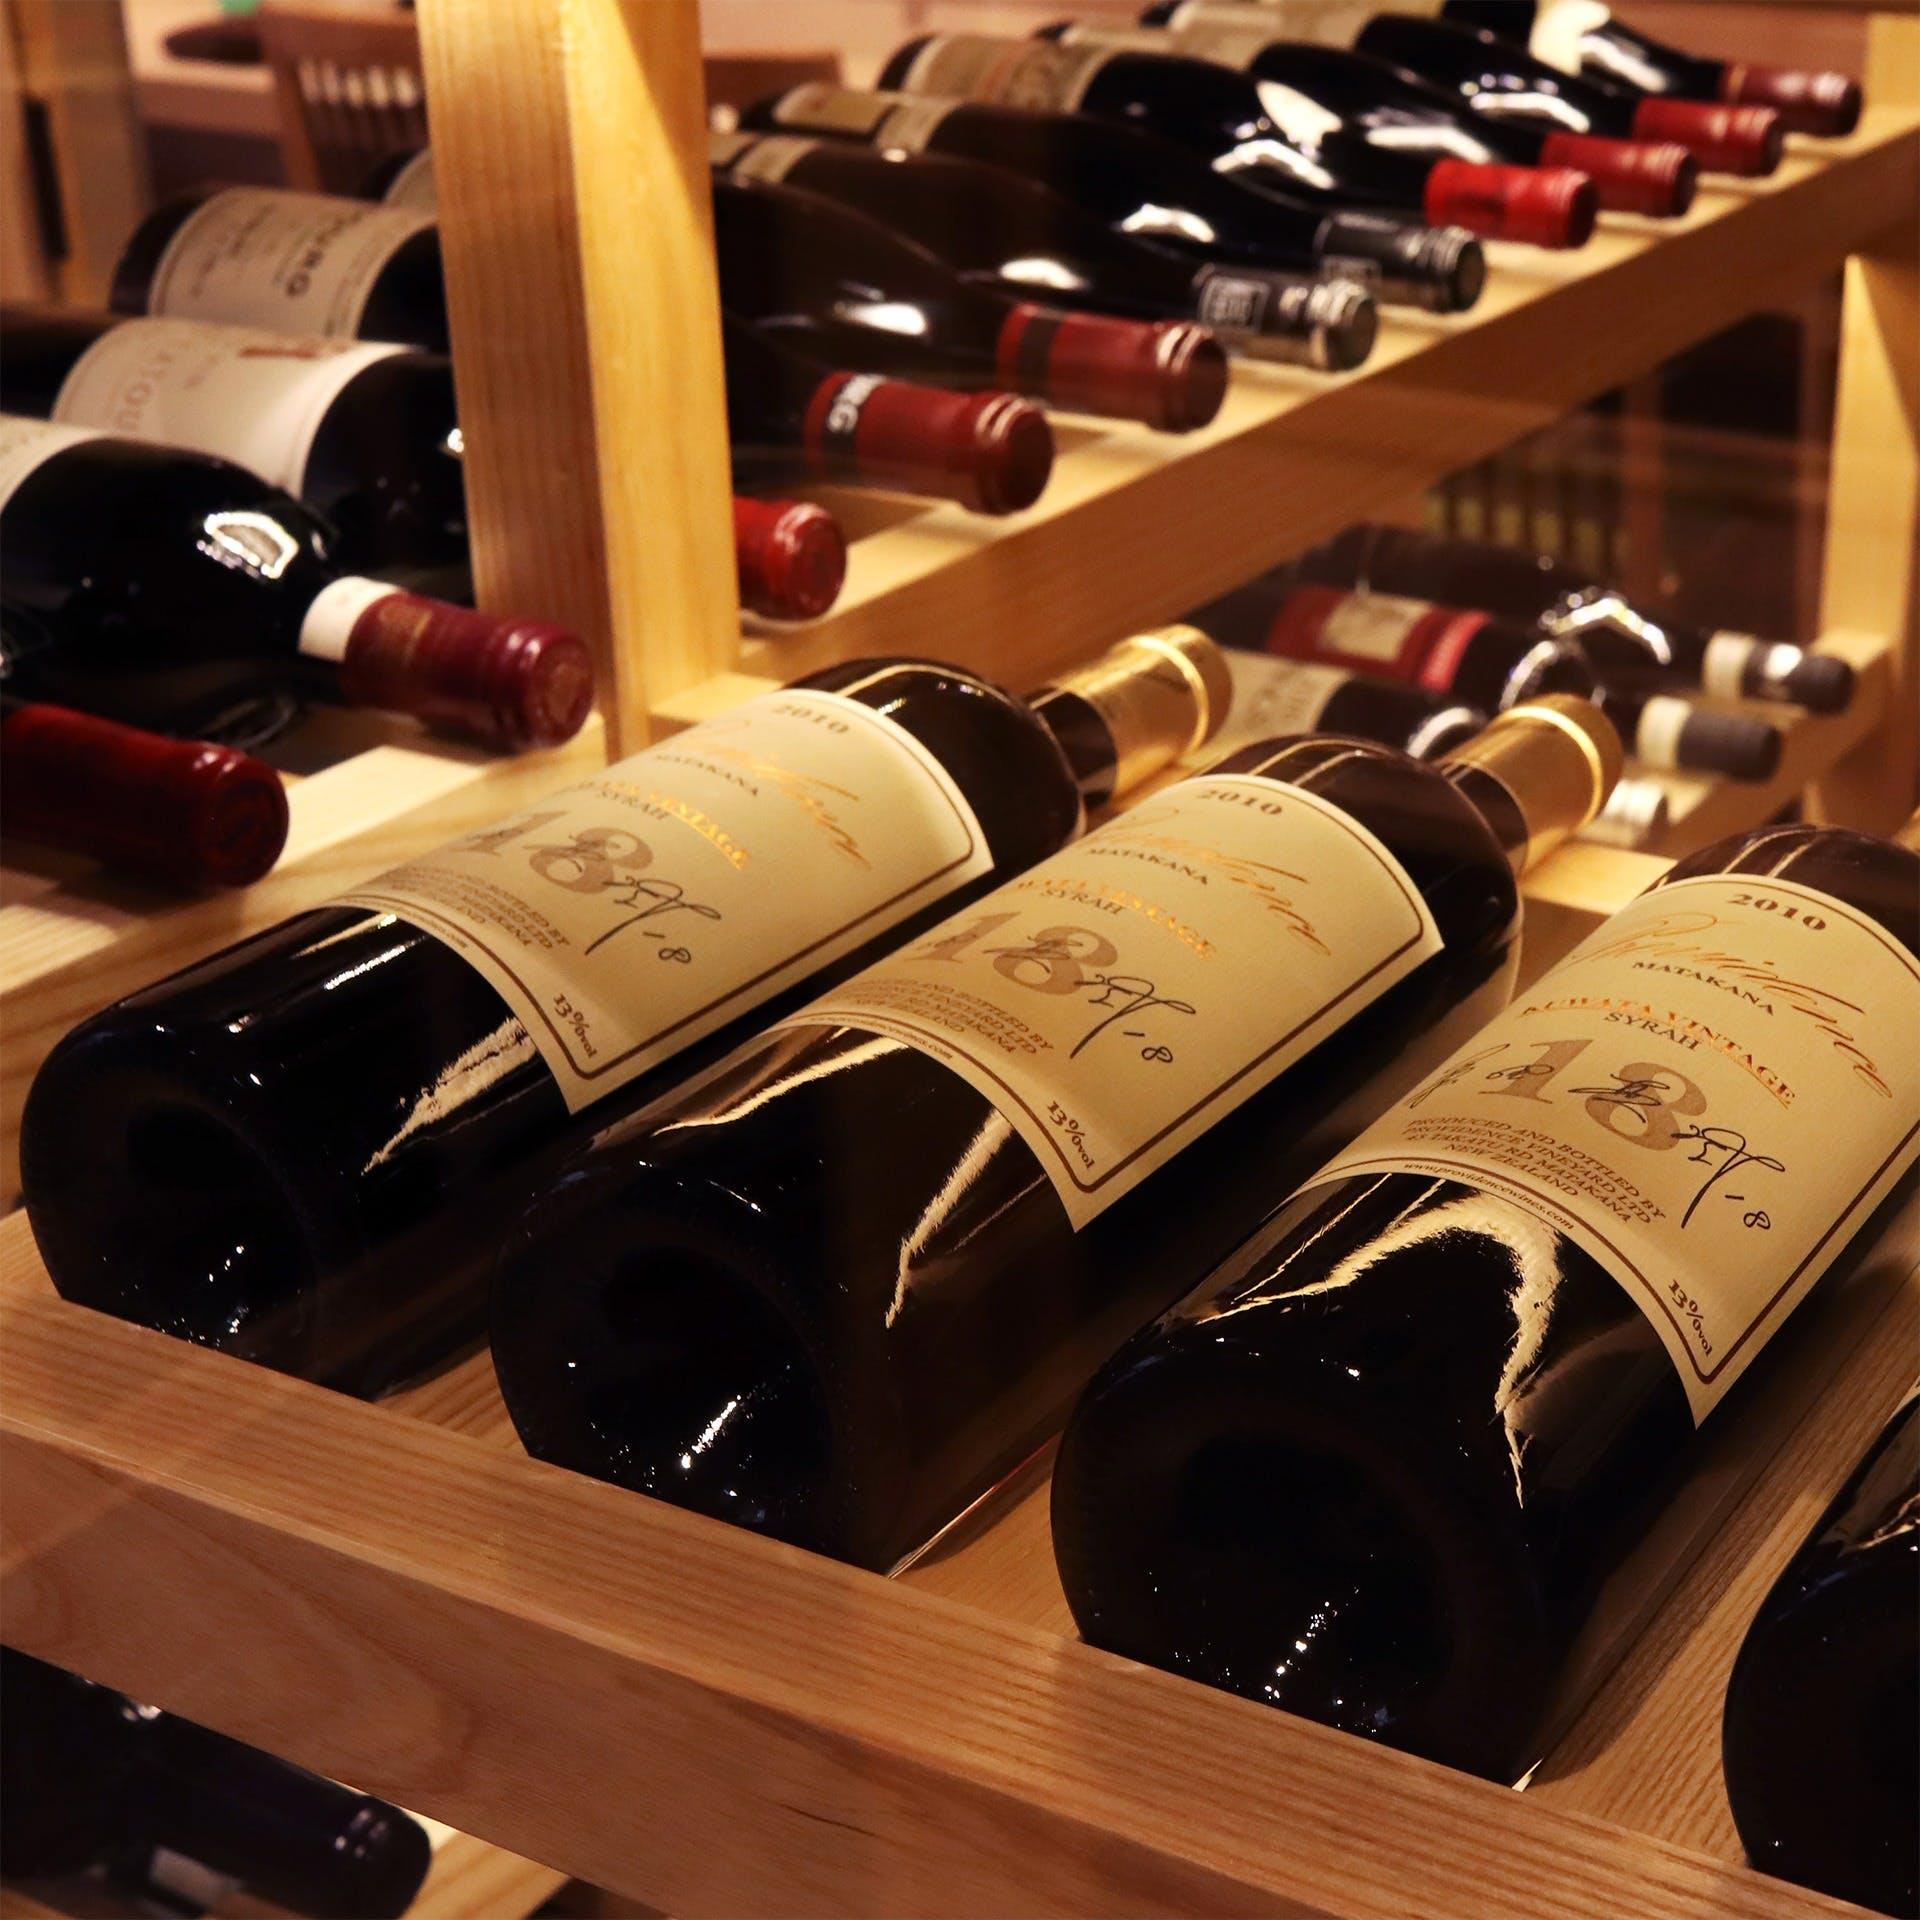 D.R.C等の希少ワインや日本酒も並ぶ充実のワインセラー